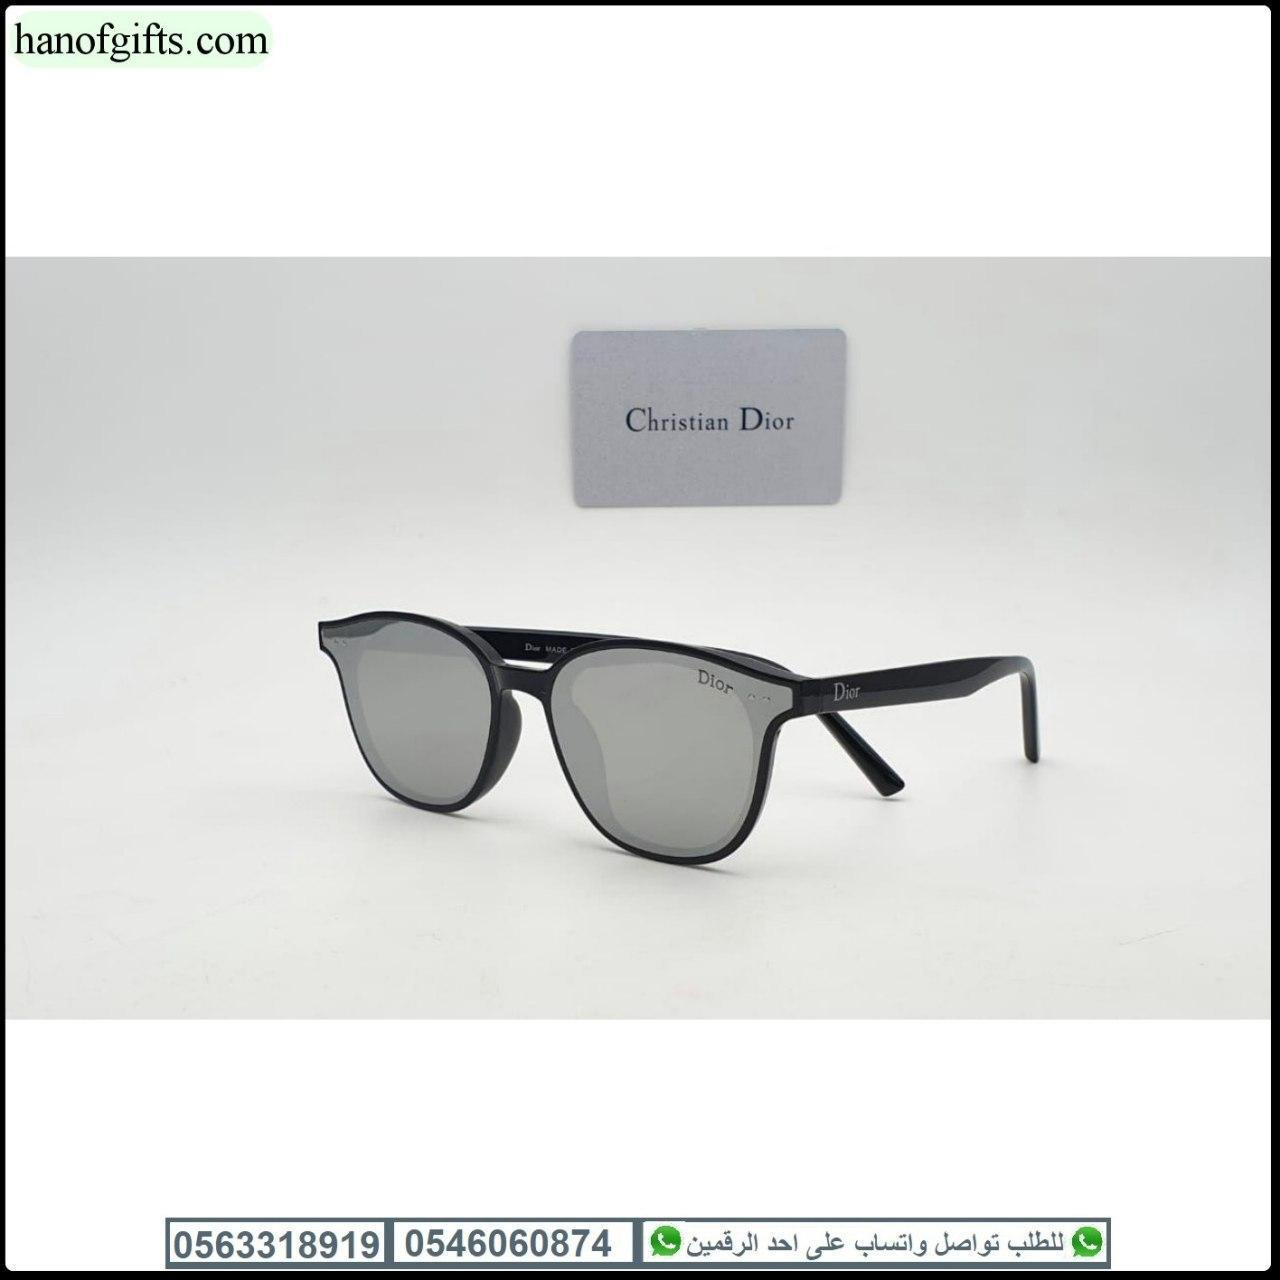 نظارة ديور نسائية